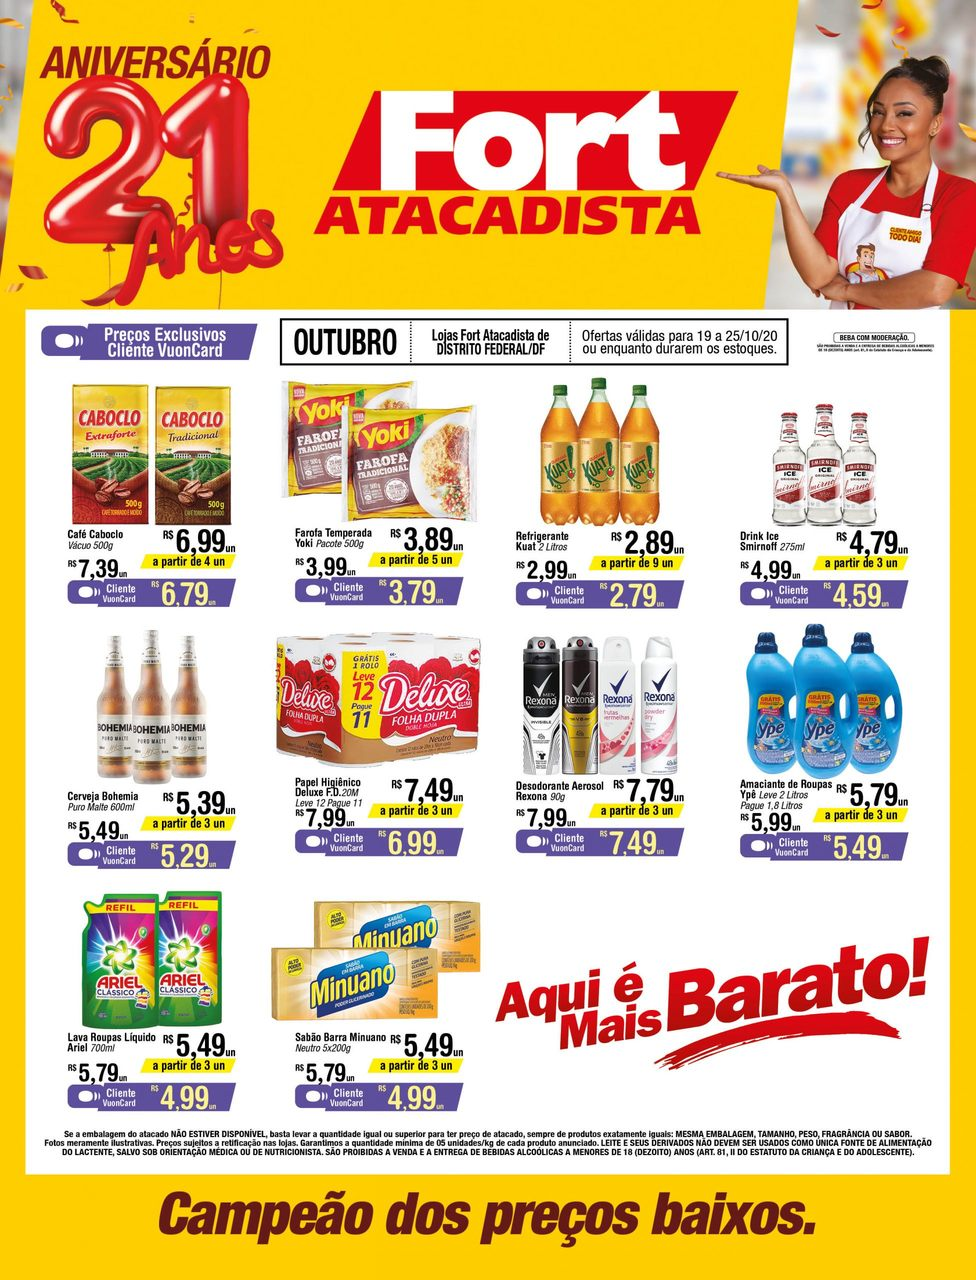 Ofertas_de_supermercado__FORT_atacadista_vence_25